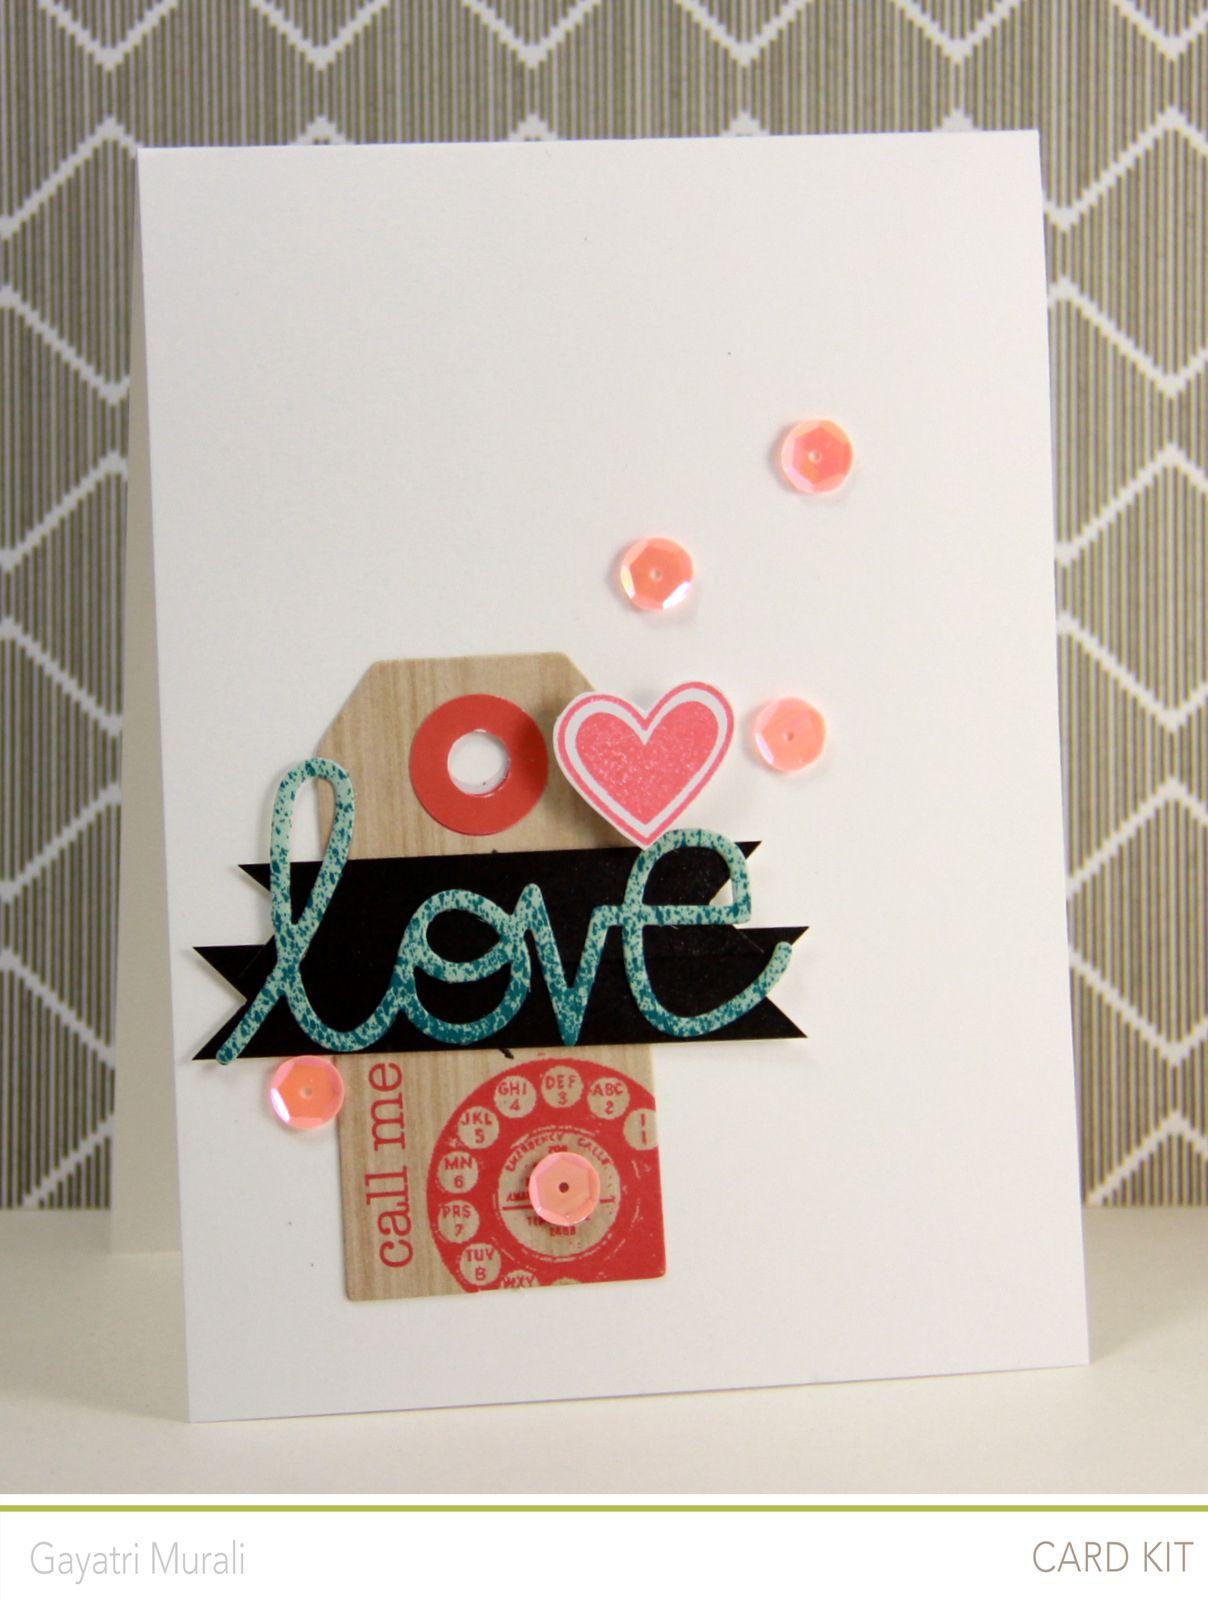 Handmade by g studio calico april kis revealed cards i love